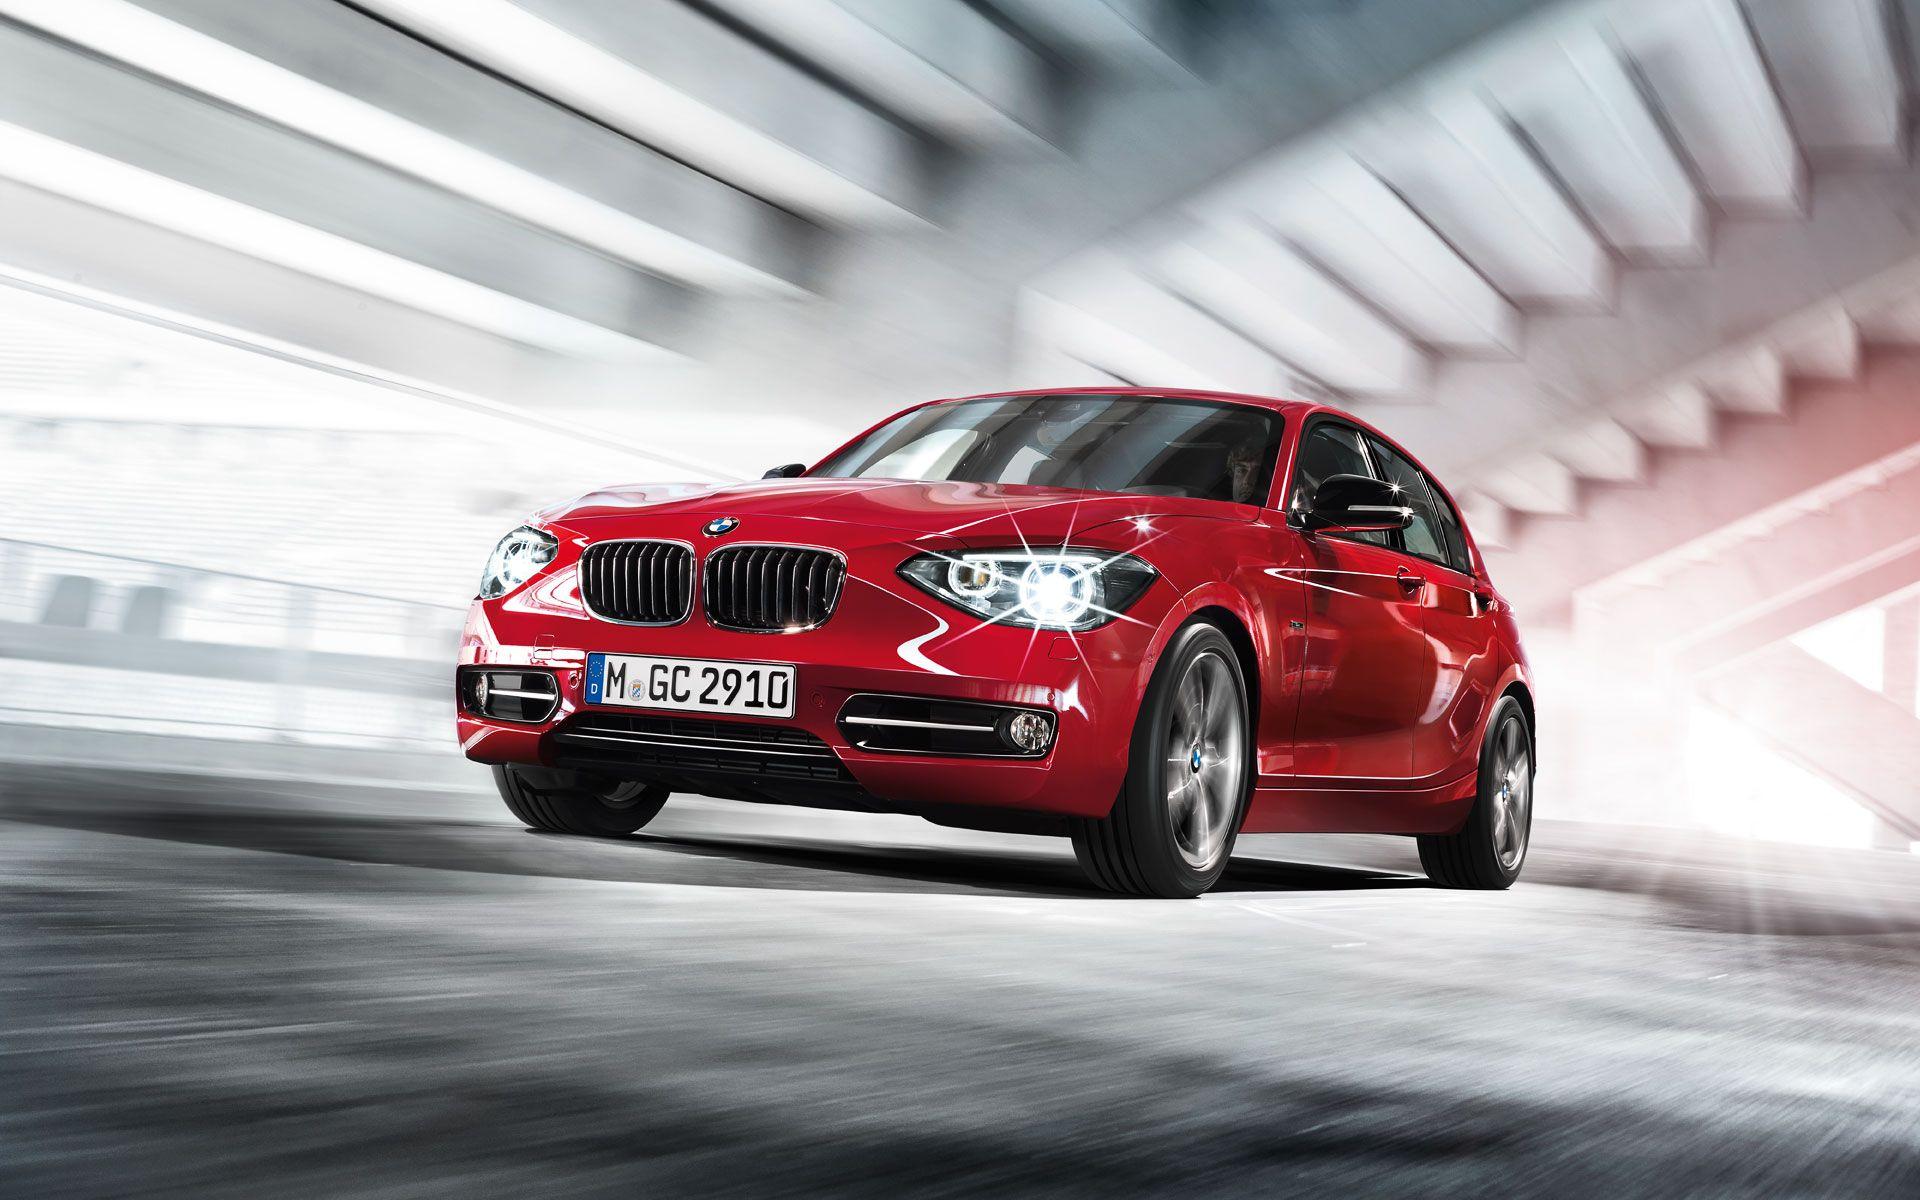 2013 BMW 1 Series Hatchback, red car, wallpaper, front